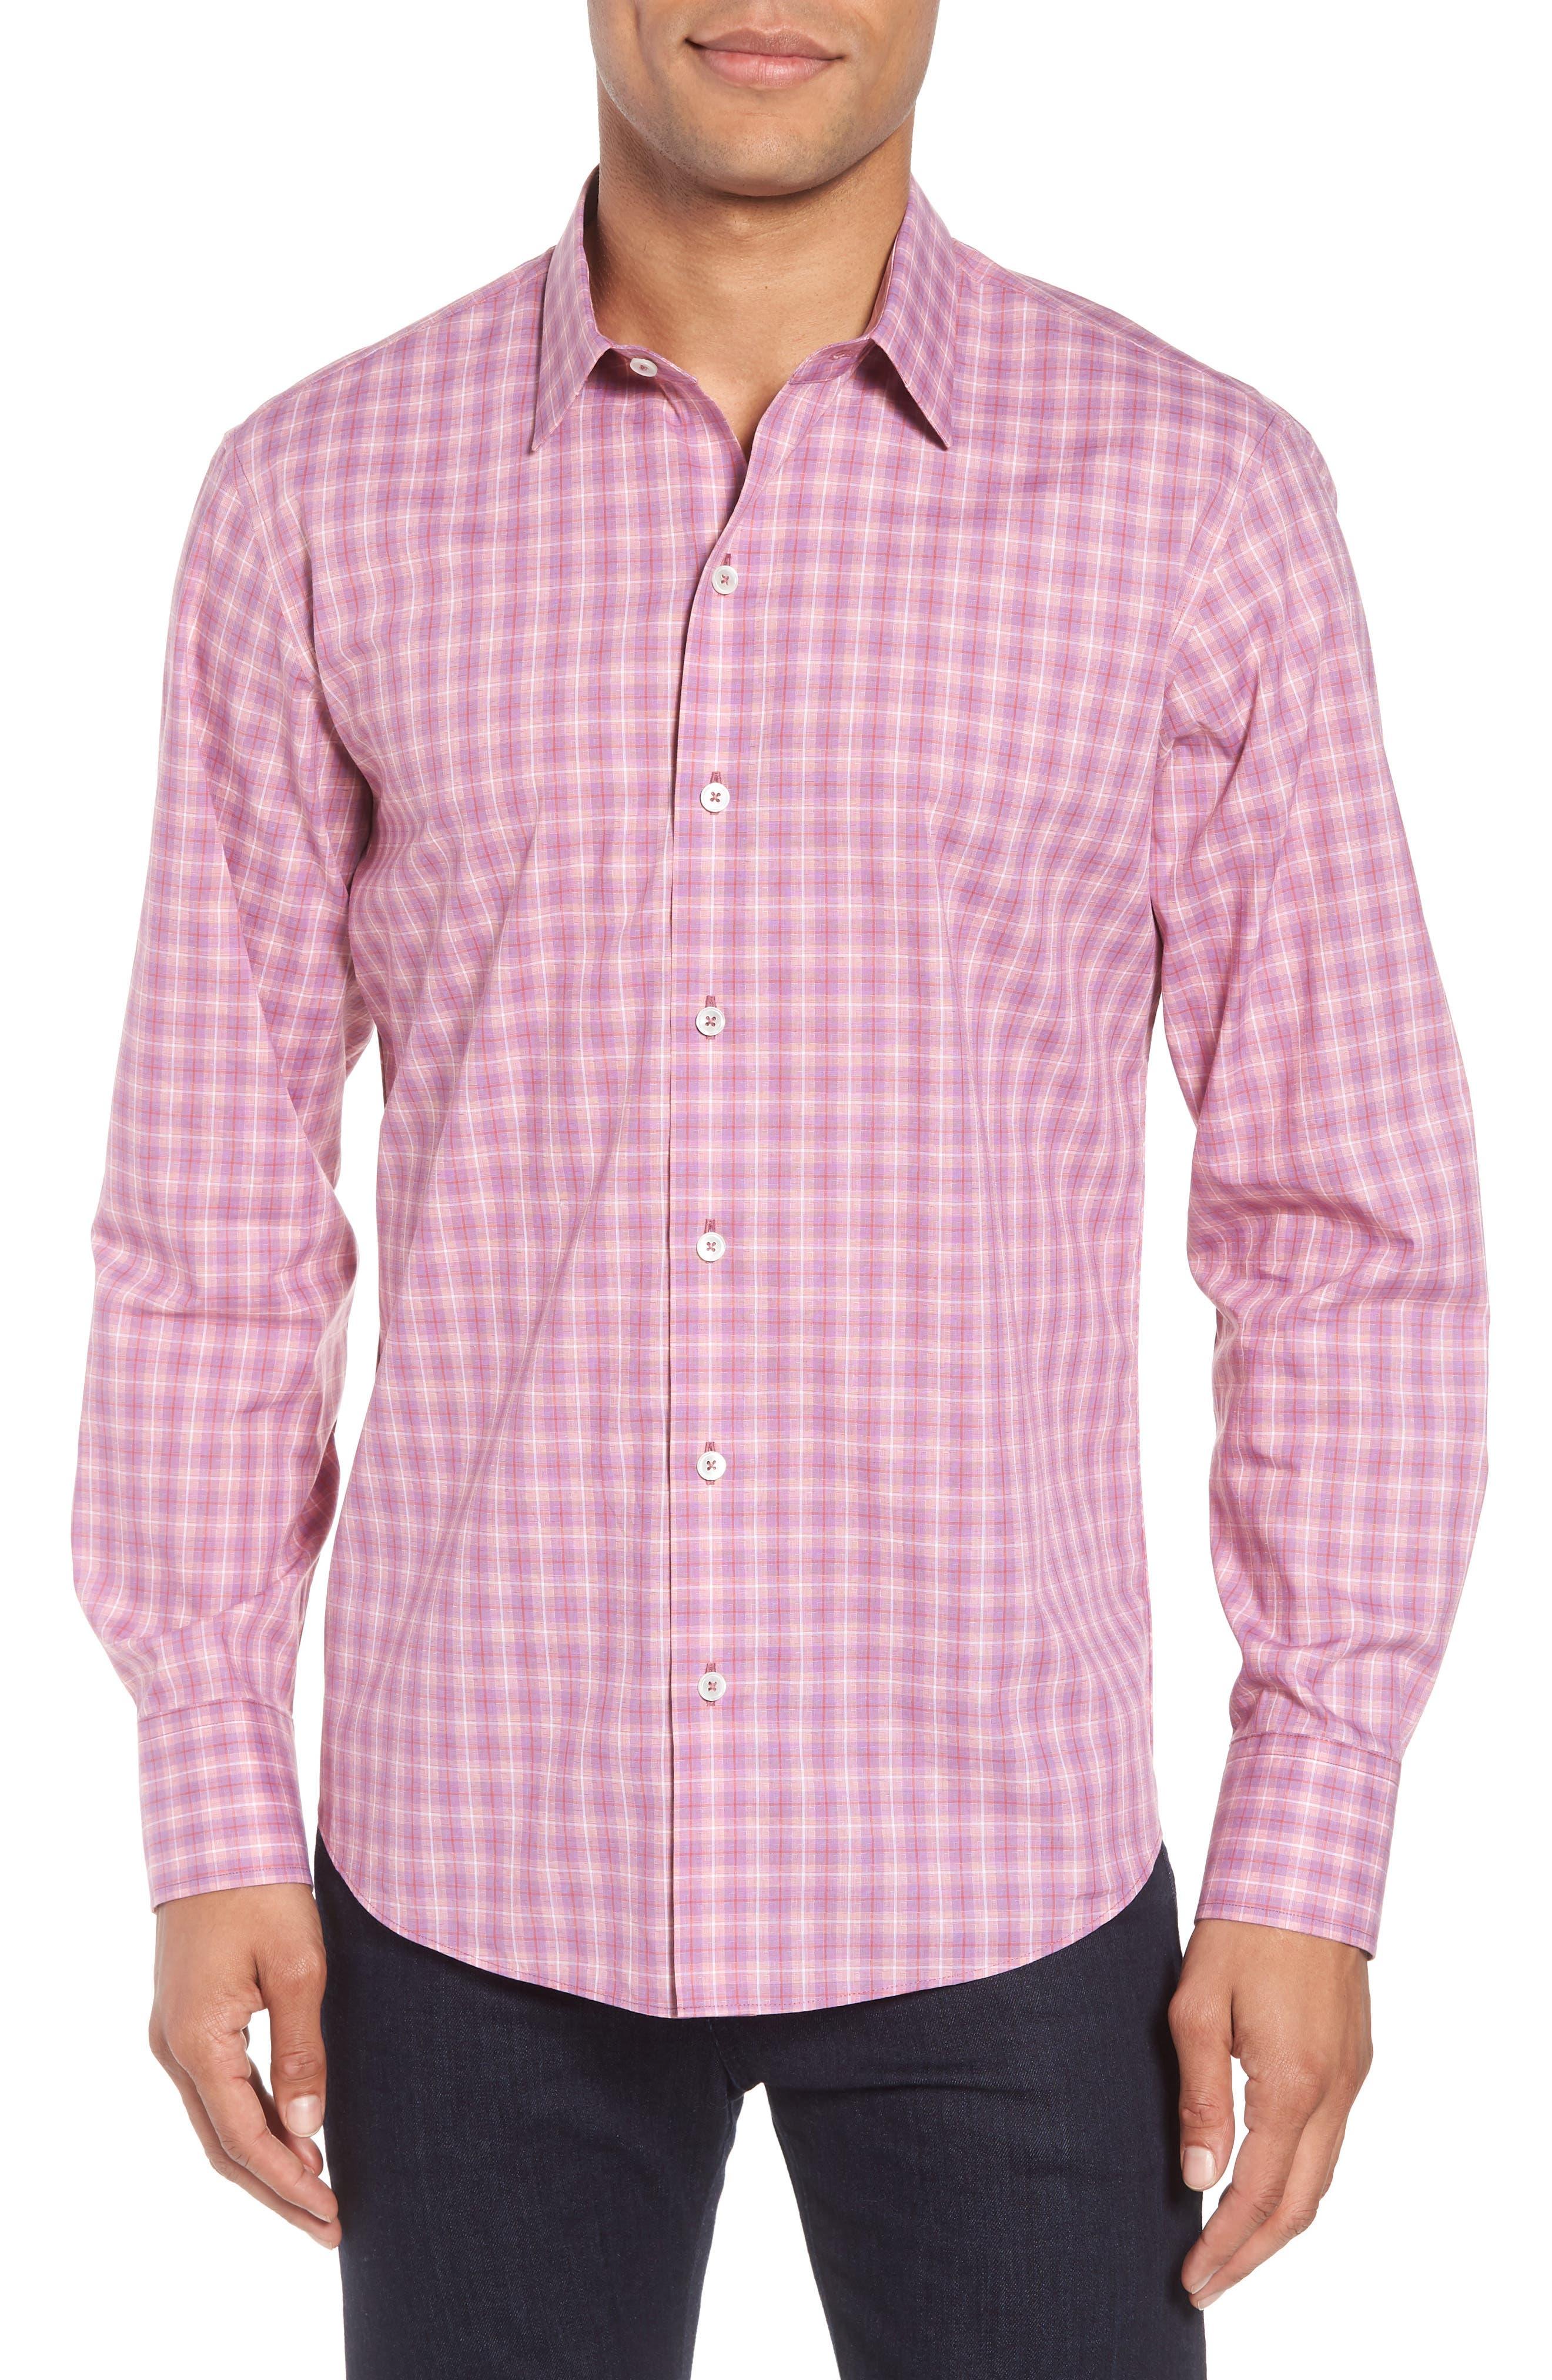 ZACHARY PRELL, Duran Regular Fit Sport Shirt, Main thumbnail 1, color, PINK